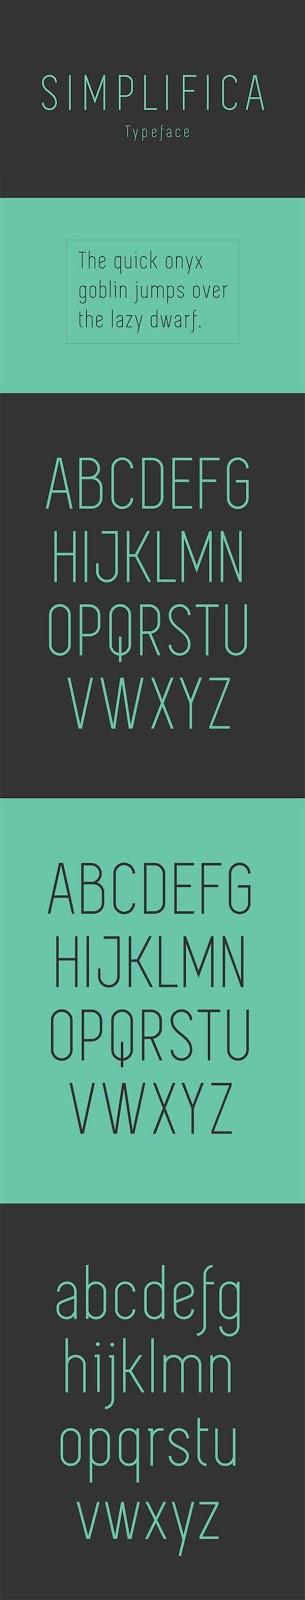 Download Gratis Sans Serif Komersial Font - Simplifica Typeface